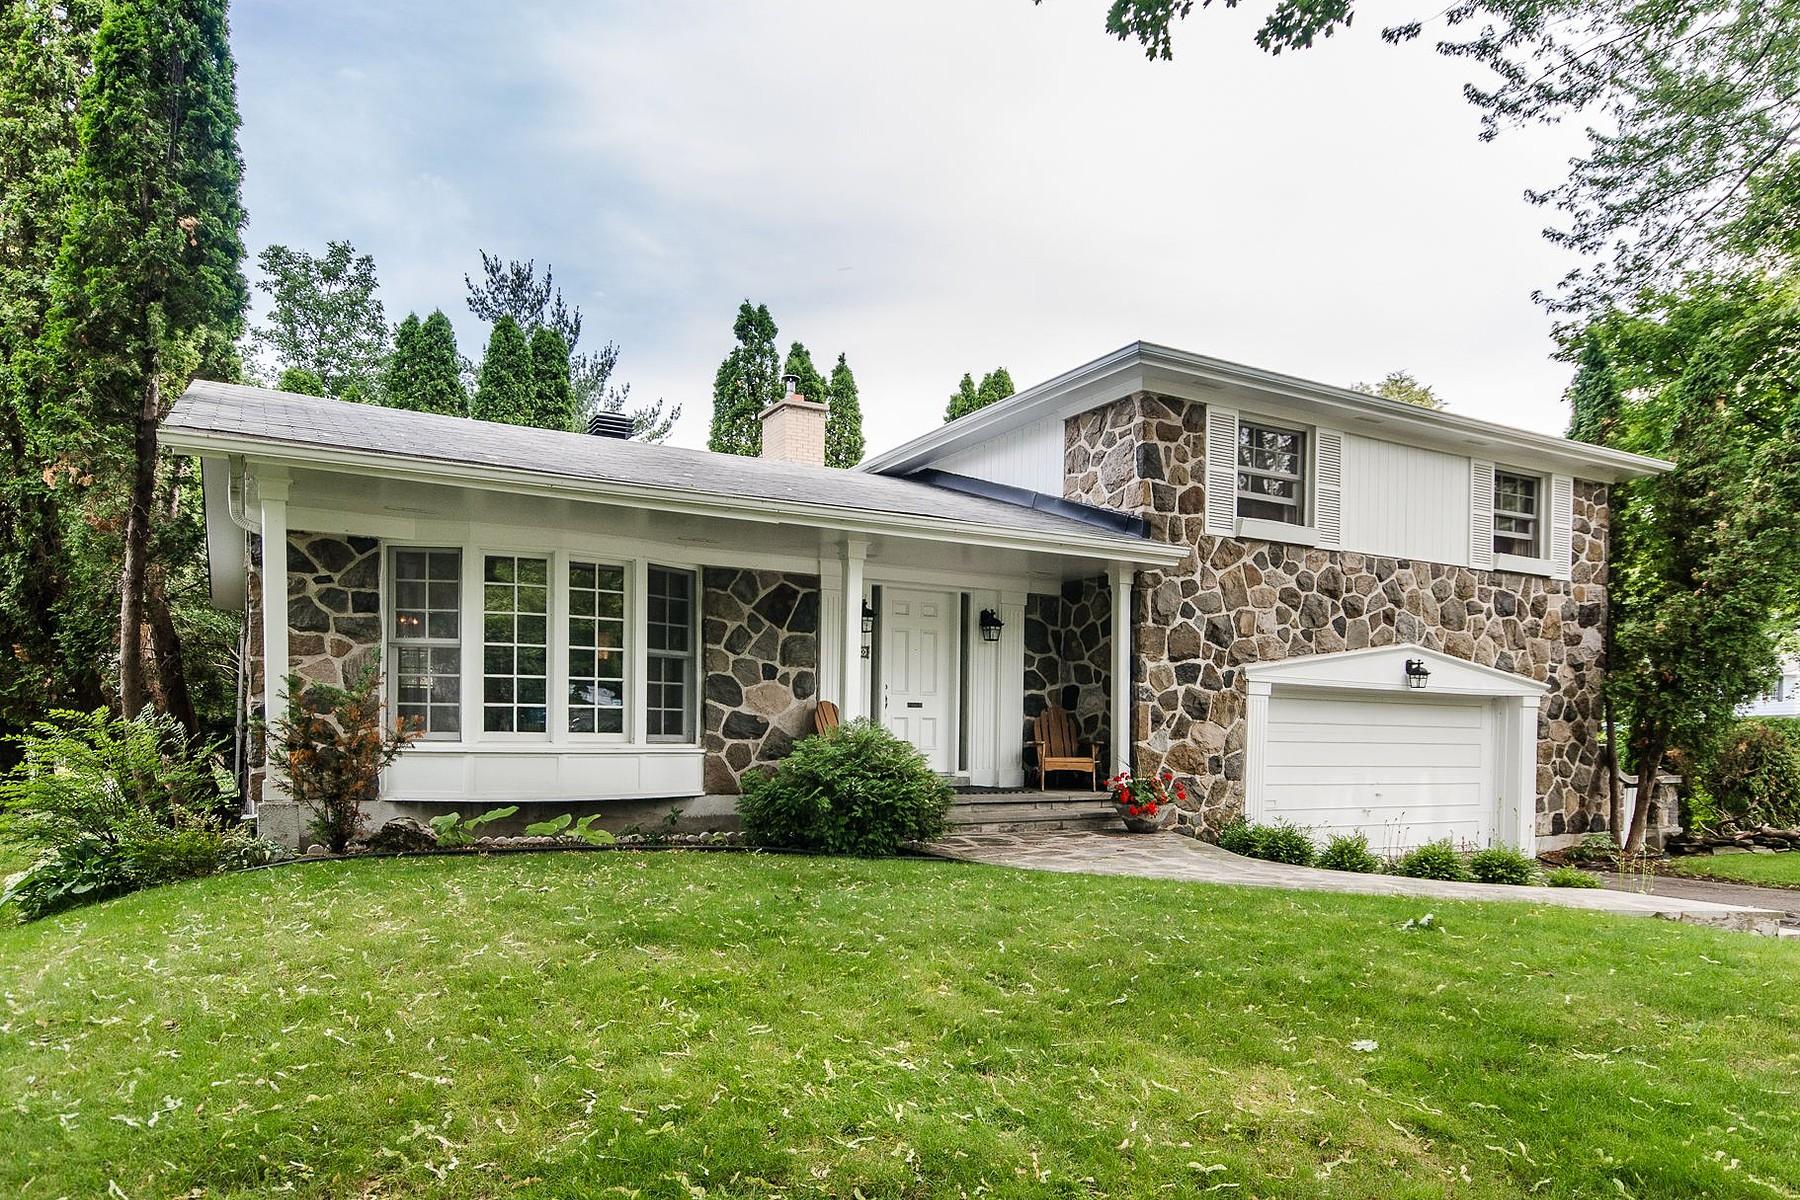 Villa per Vendita alle ore Saint-Lambert, Montérégie 740 Boul. Houde Saint-Lambert, Quebec J4R1L8 Canada